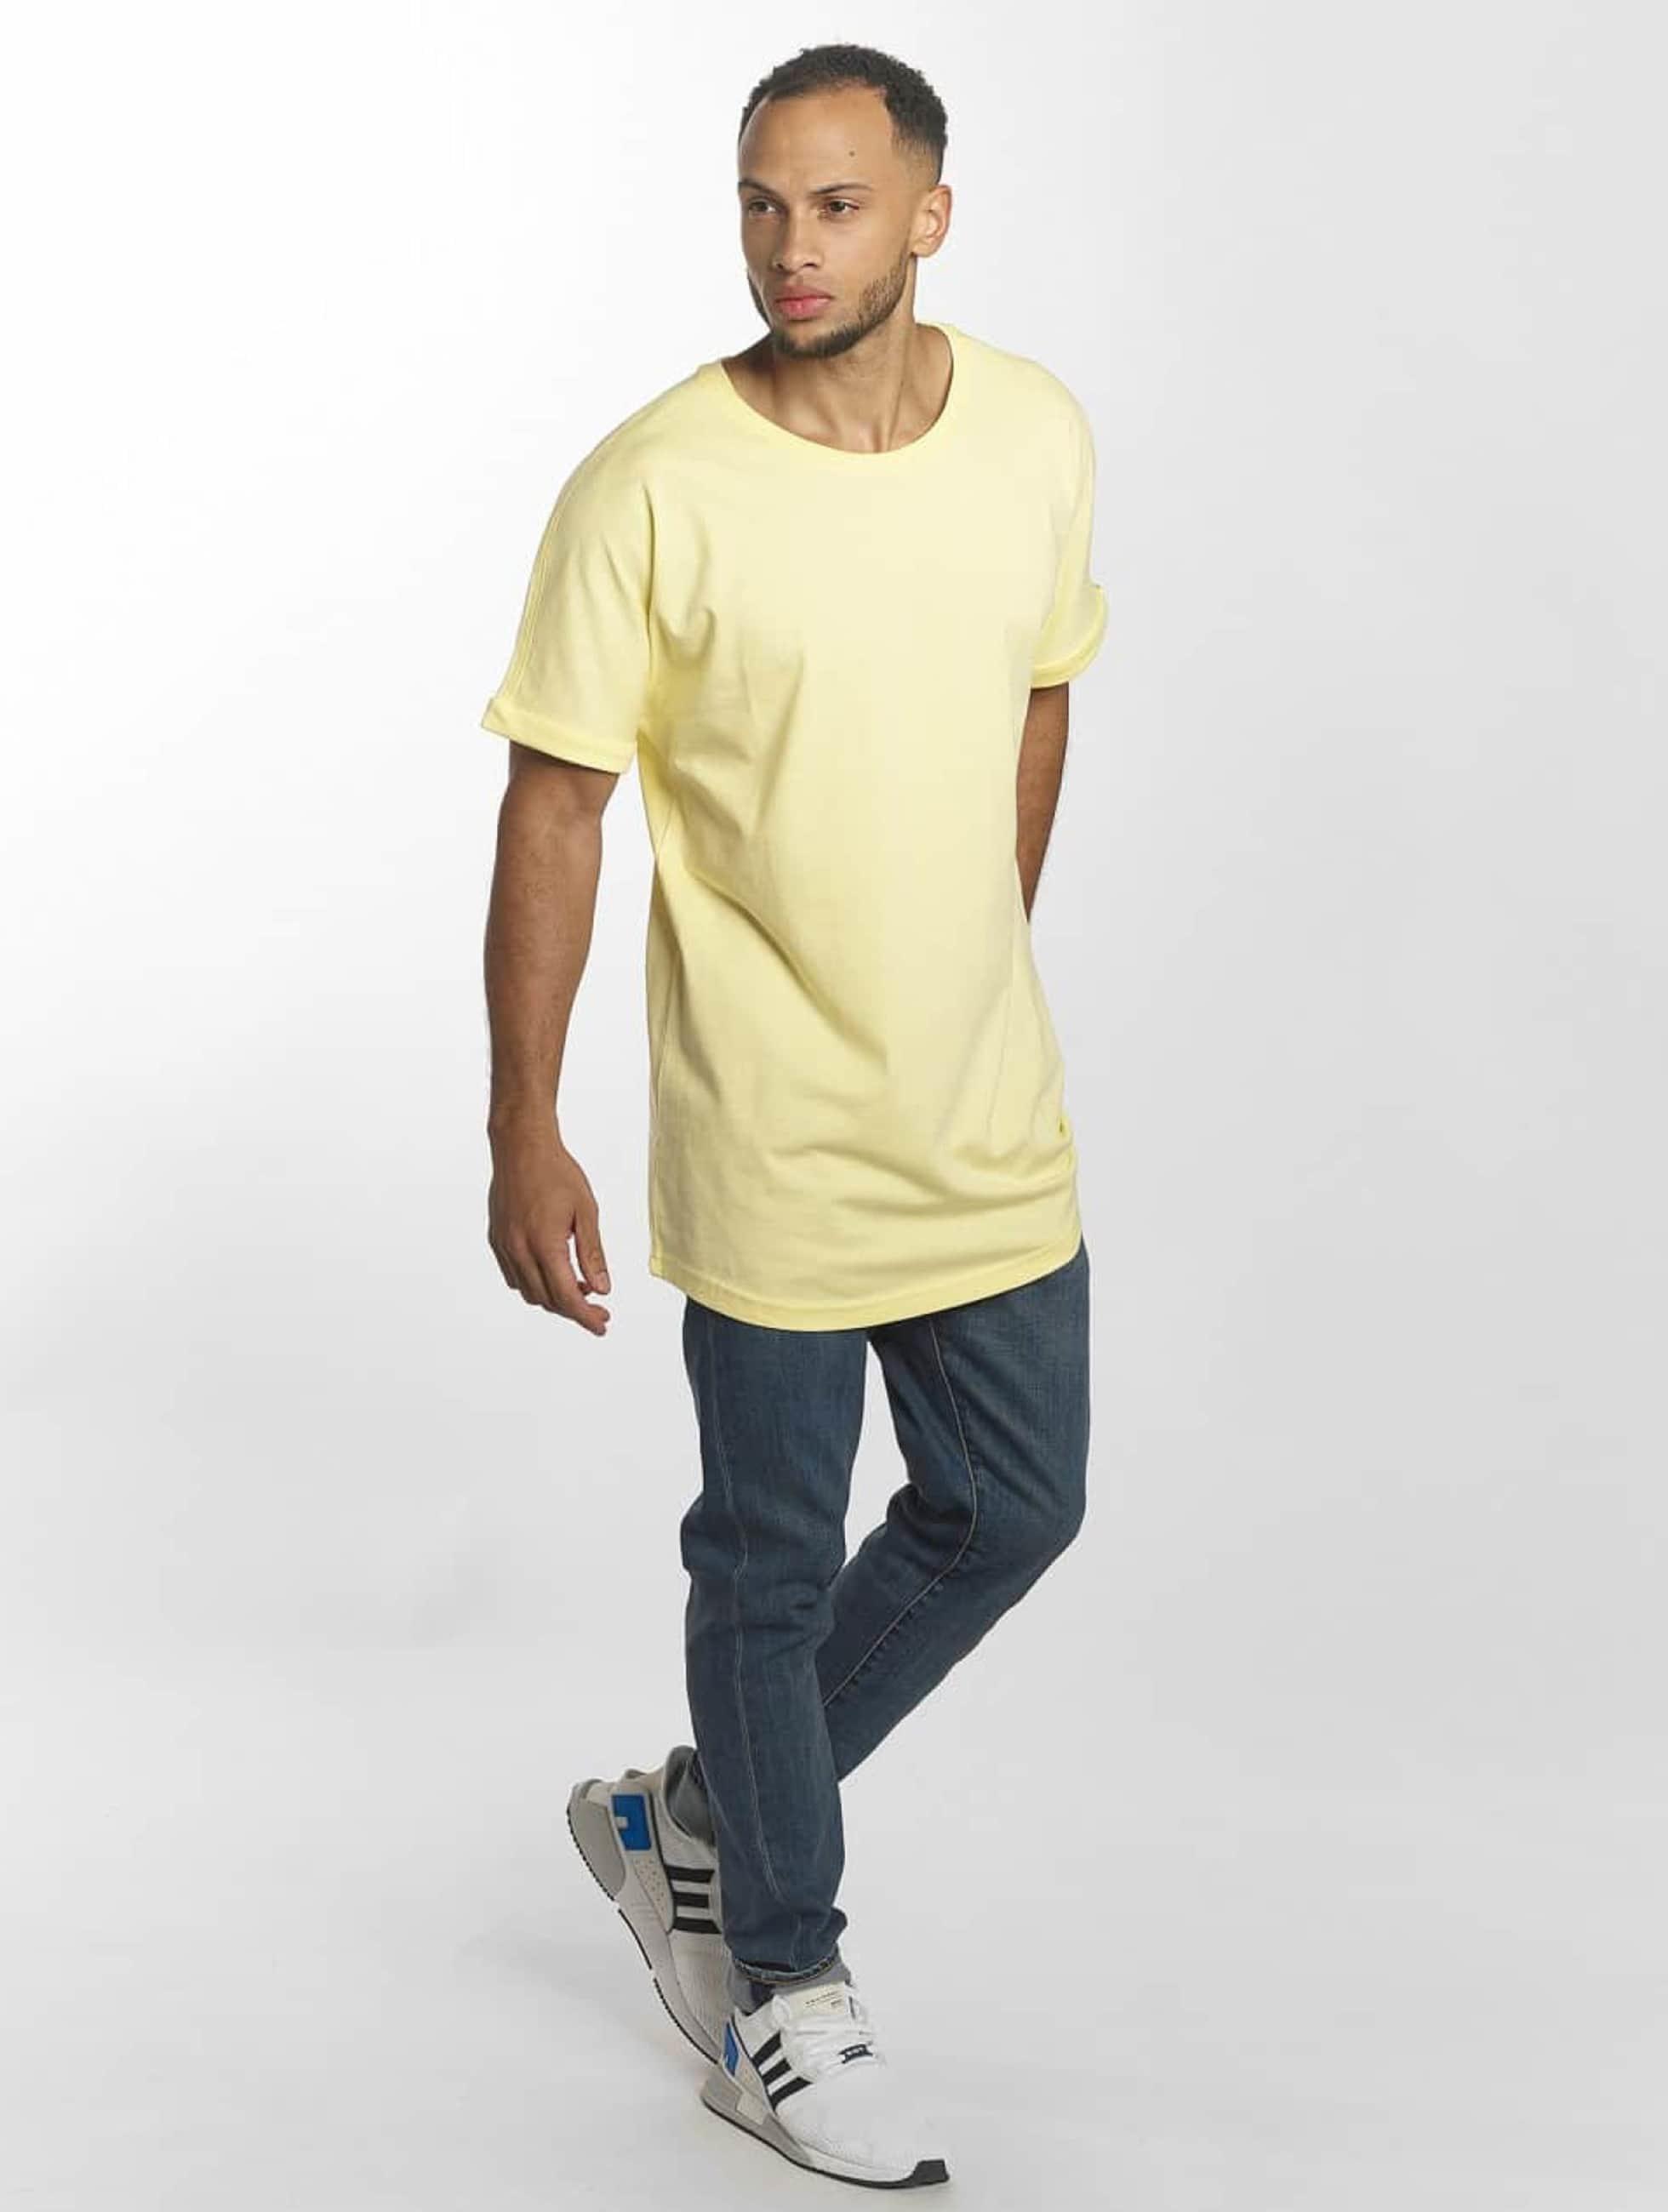 Urban Classics Tall Tees Long Shaped Turnup желтый